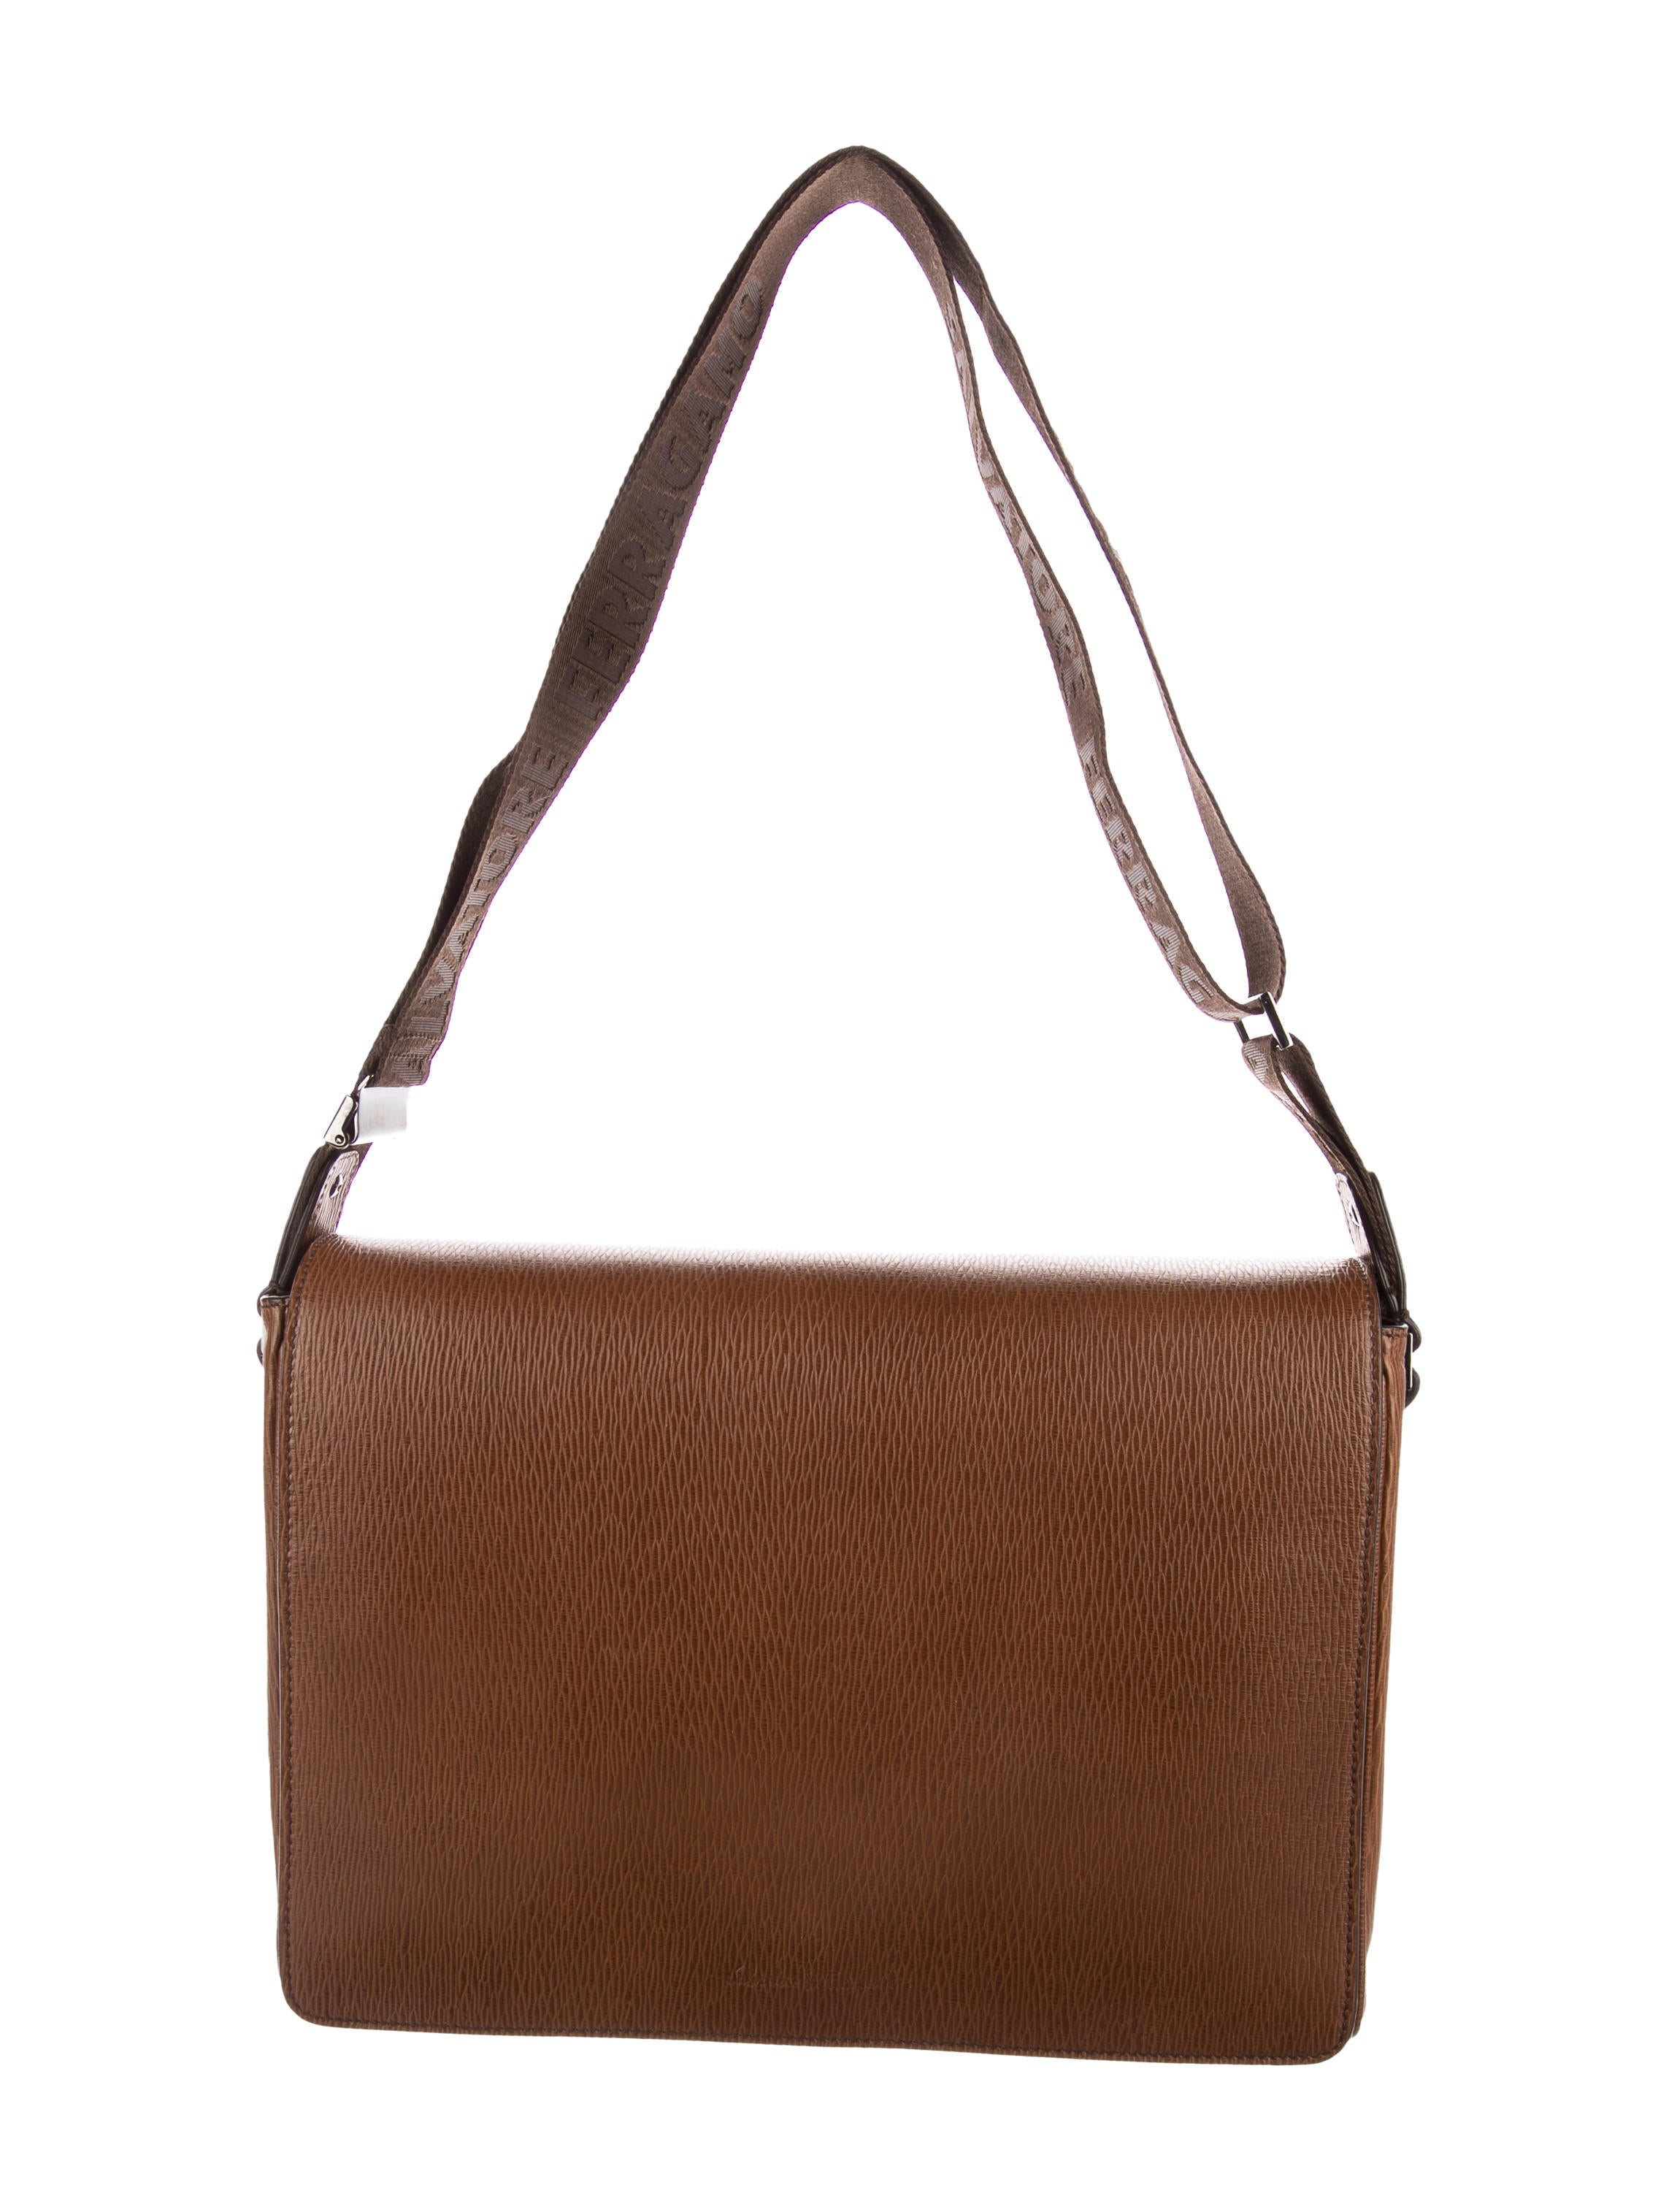 Salvatore Ferragamo Grain Leather Messenger - Bags - SAL58306  91b086c1cd05f